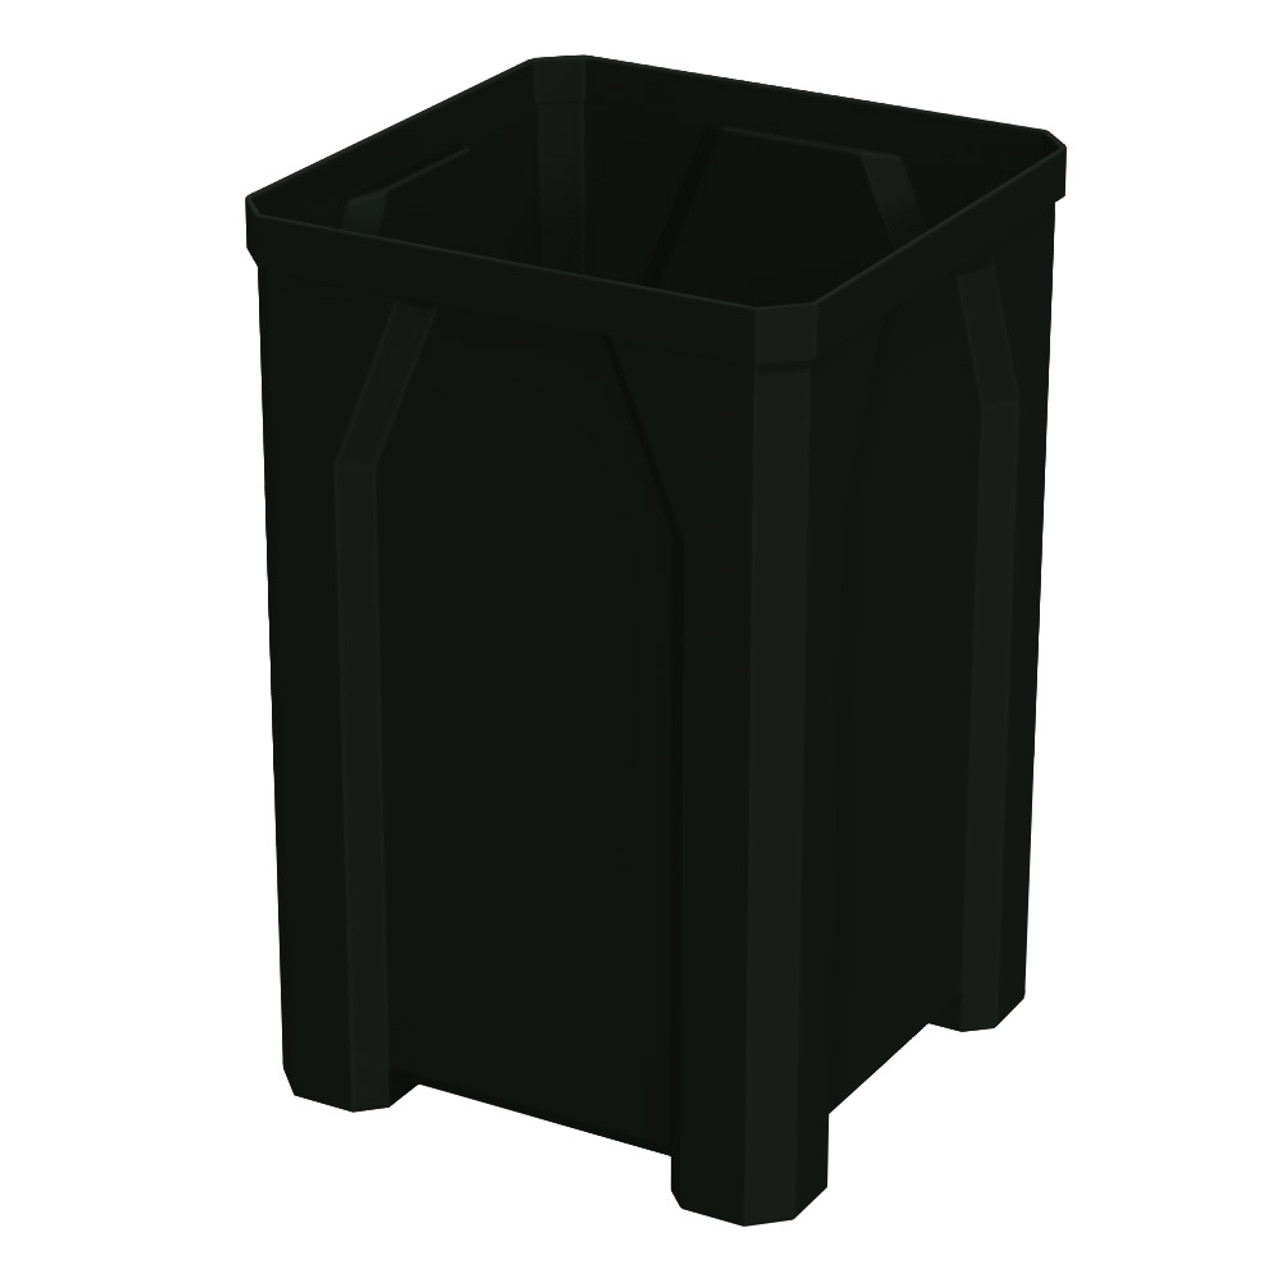 32 Gallon Kolor Can Square Plastic Utility Trash Receptacle S7800-00 BLACK NO LID